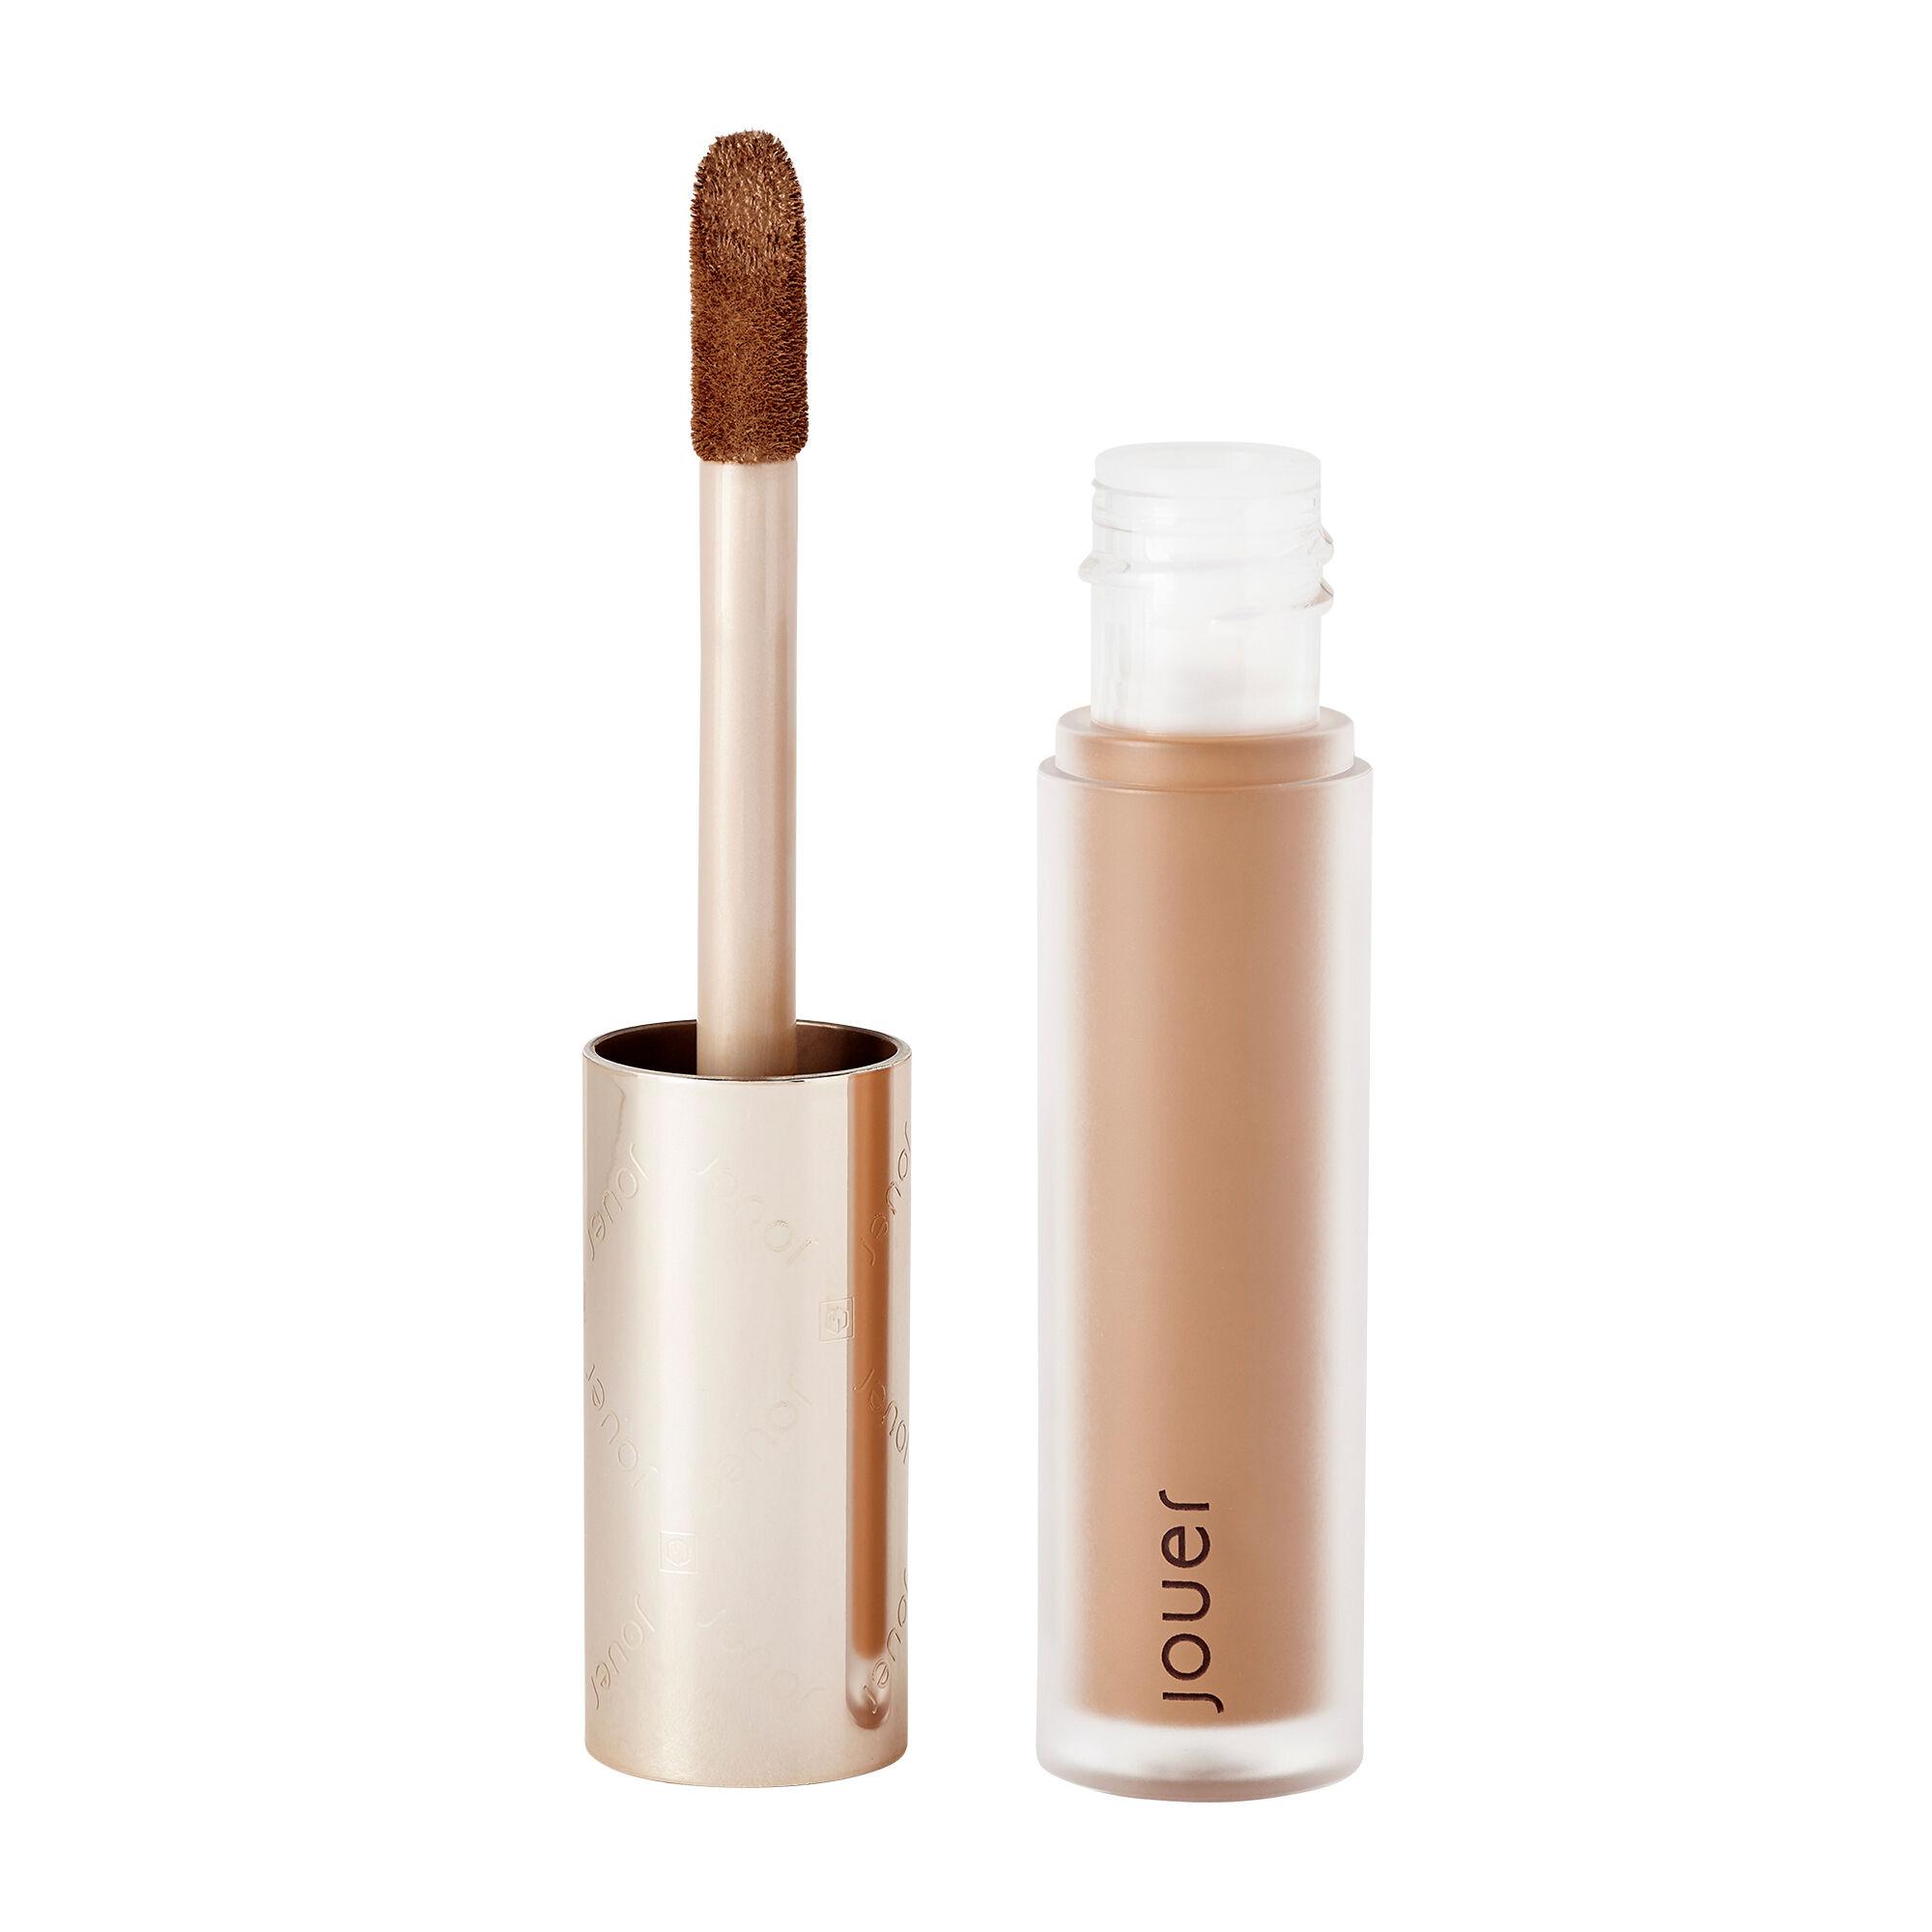 Jouer Cosmetics Essential High Coverage Liquid Concealer Cappuccino 4.14ml